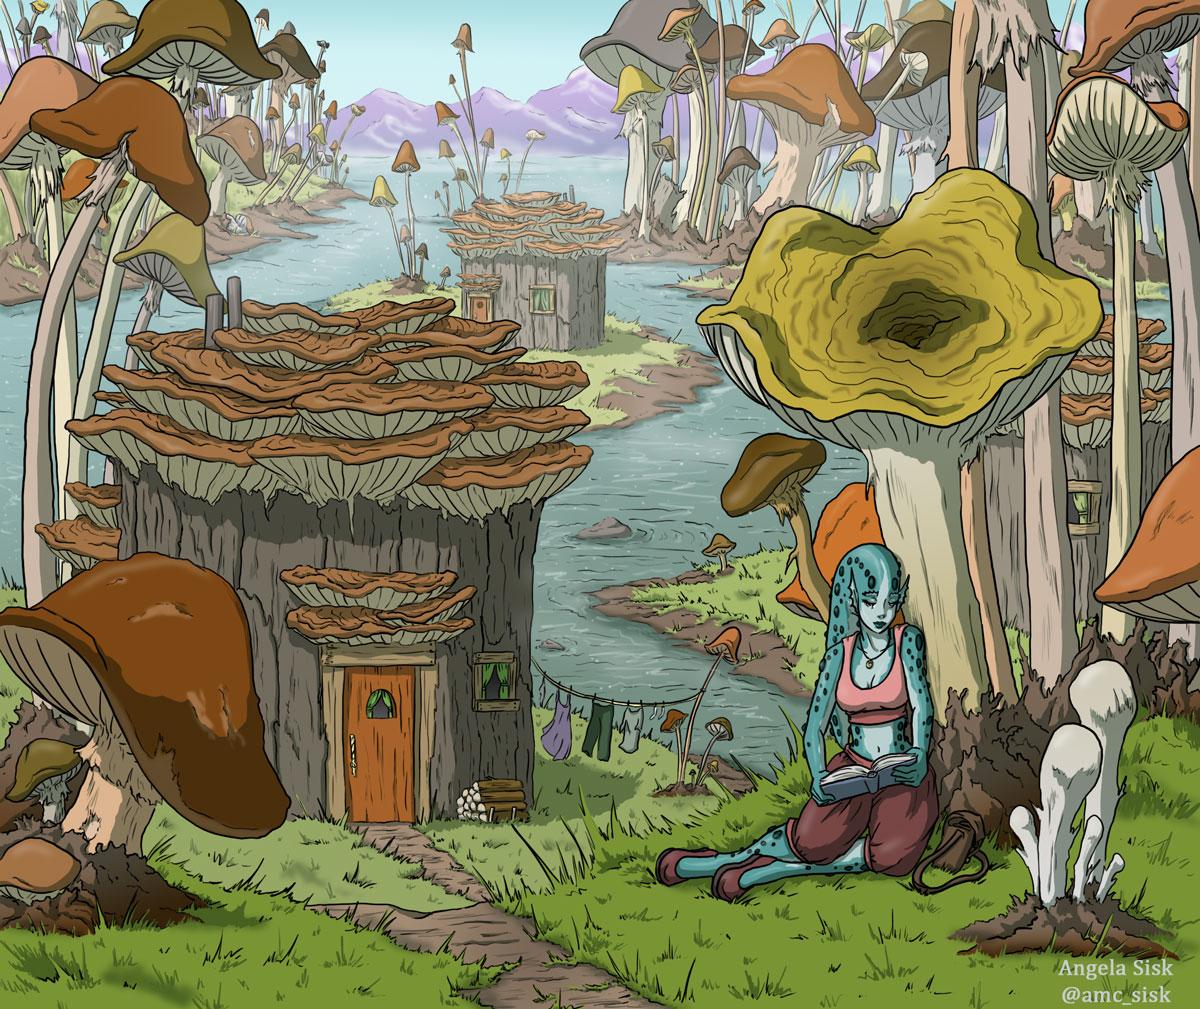 Angela Sisk mushroom village entry